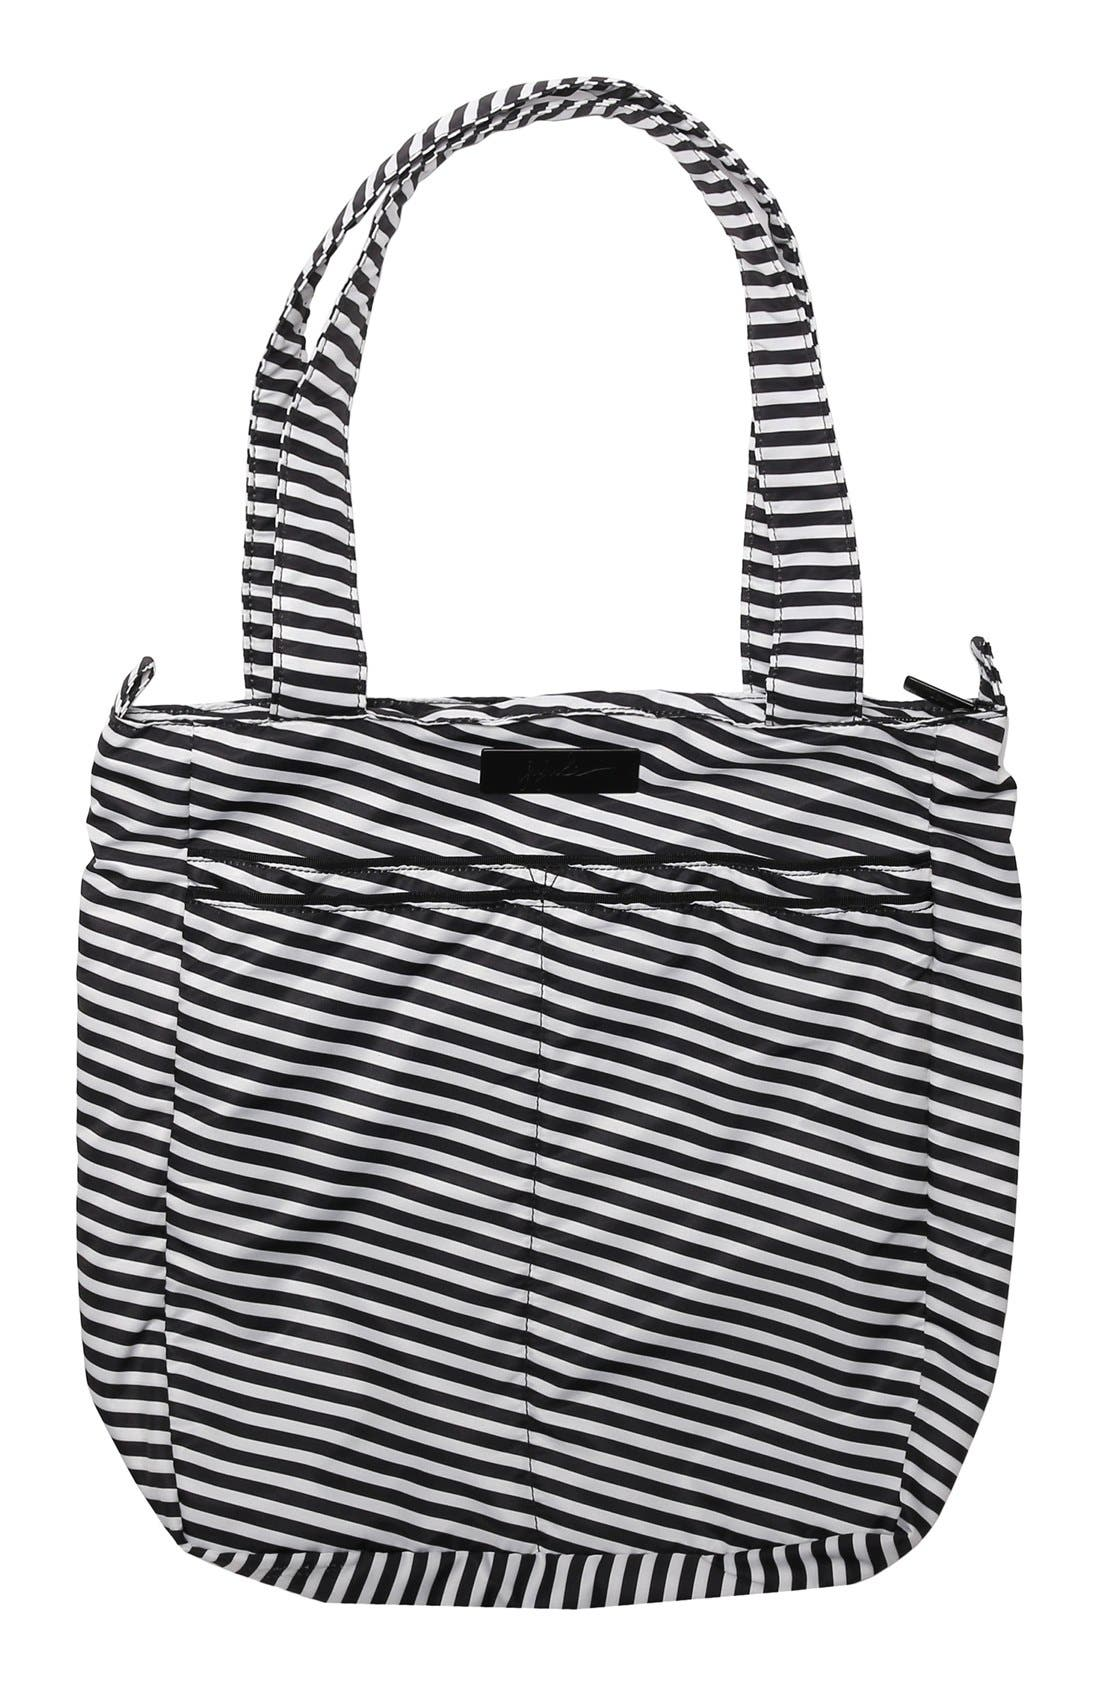 Main Image - Ju-Ju-Be 'Be Light - Onyx Collection' Diaper Bag